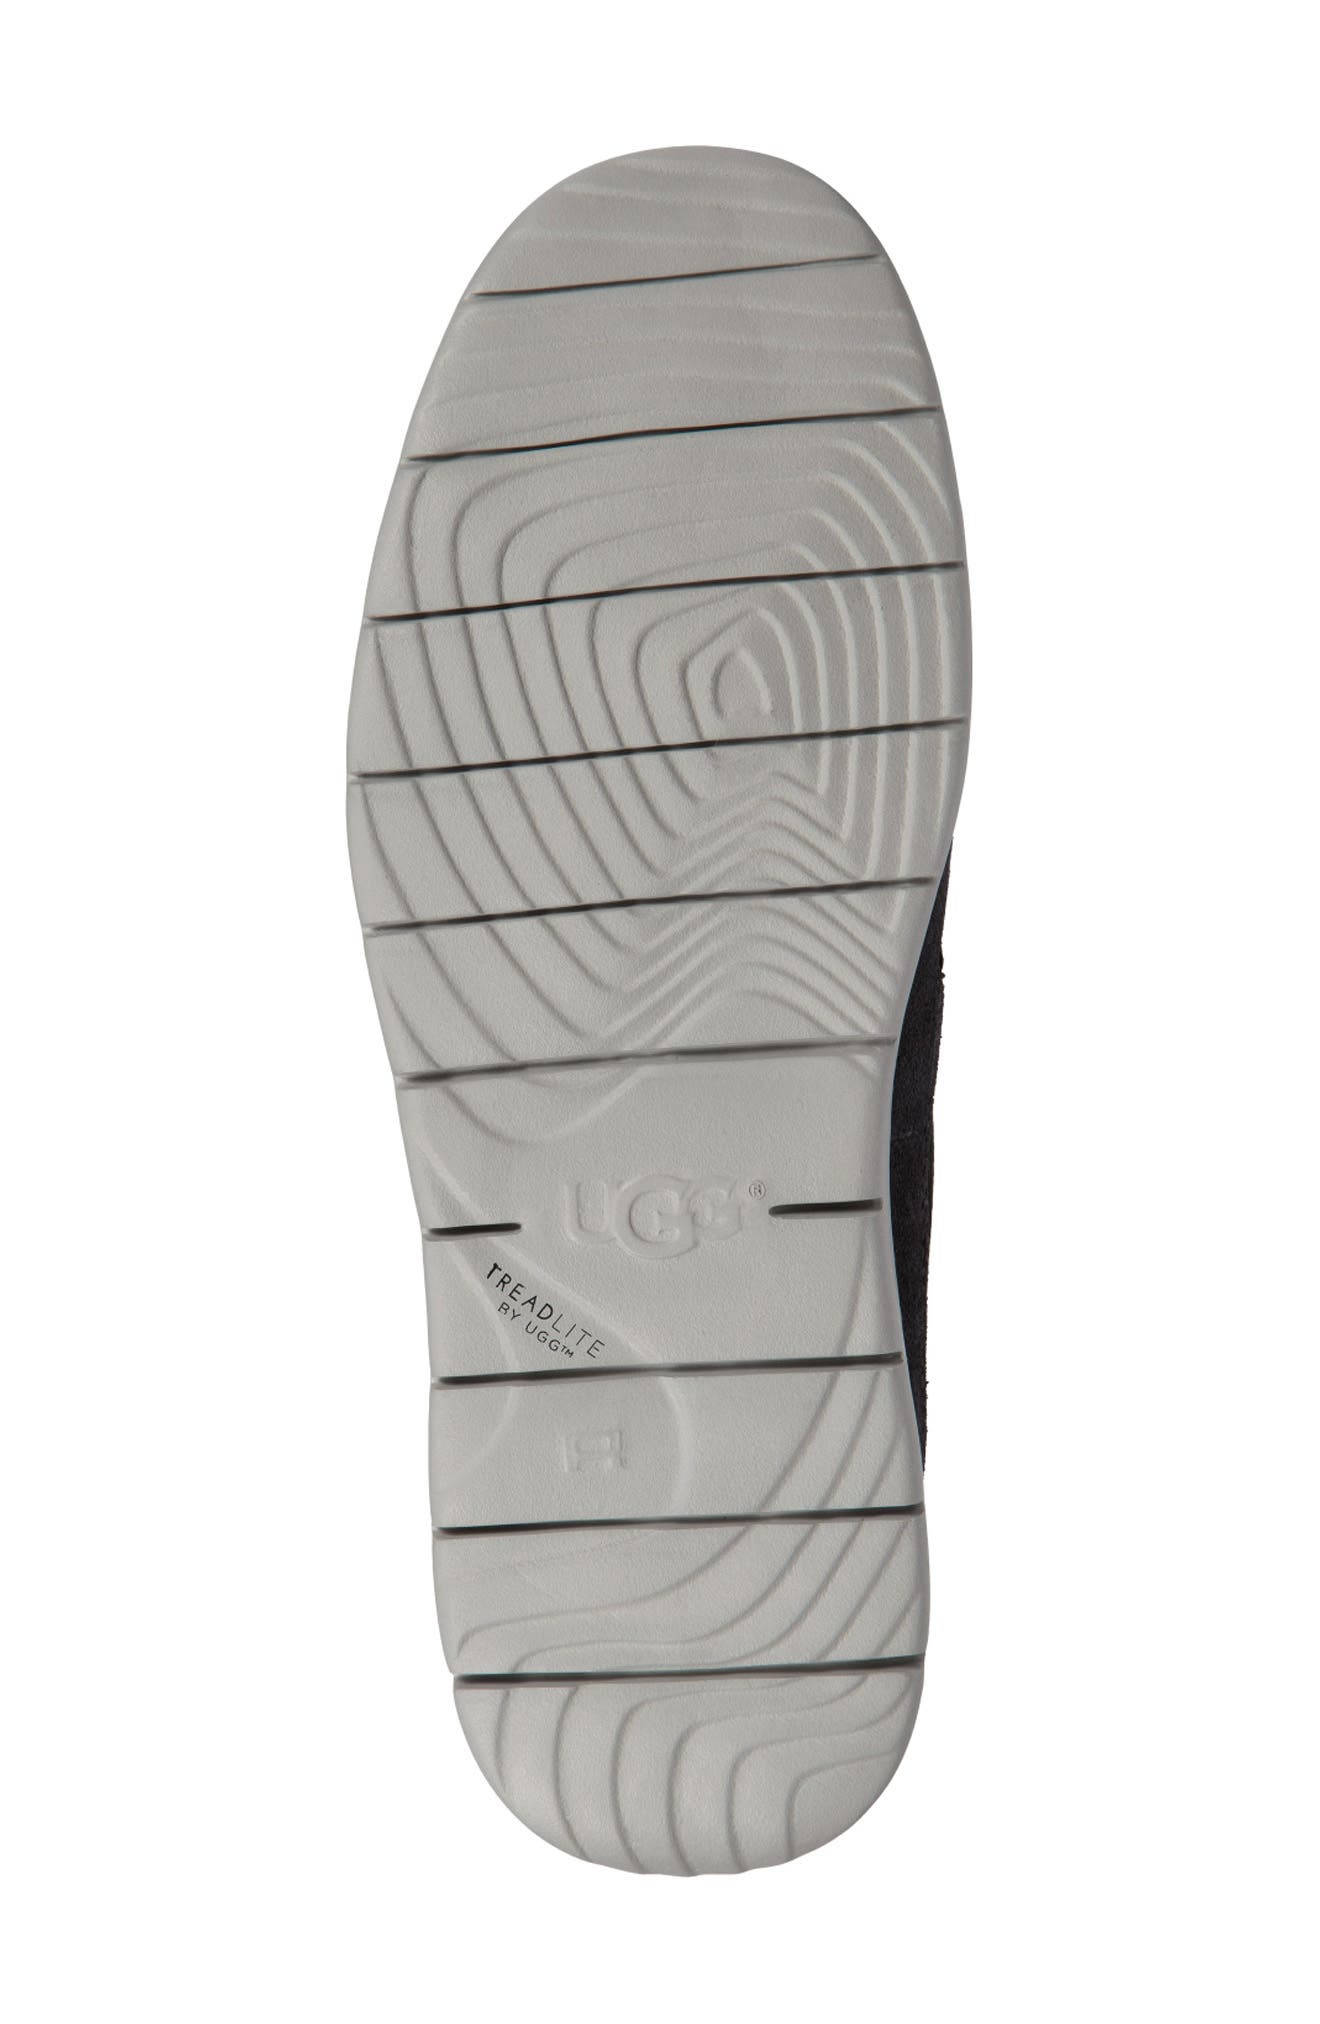 UGG<SUP>®</SUP>, Freamon Waterproof Chukka Boot, Alternate thumbnail 5, color, DARK GREY